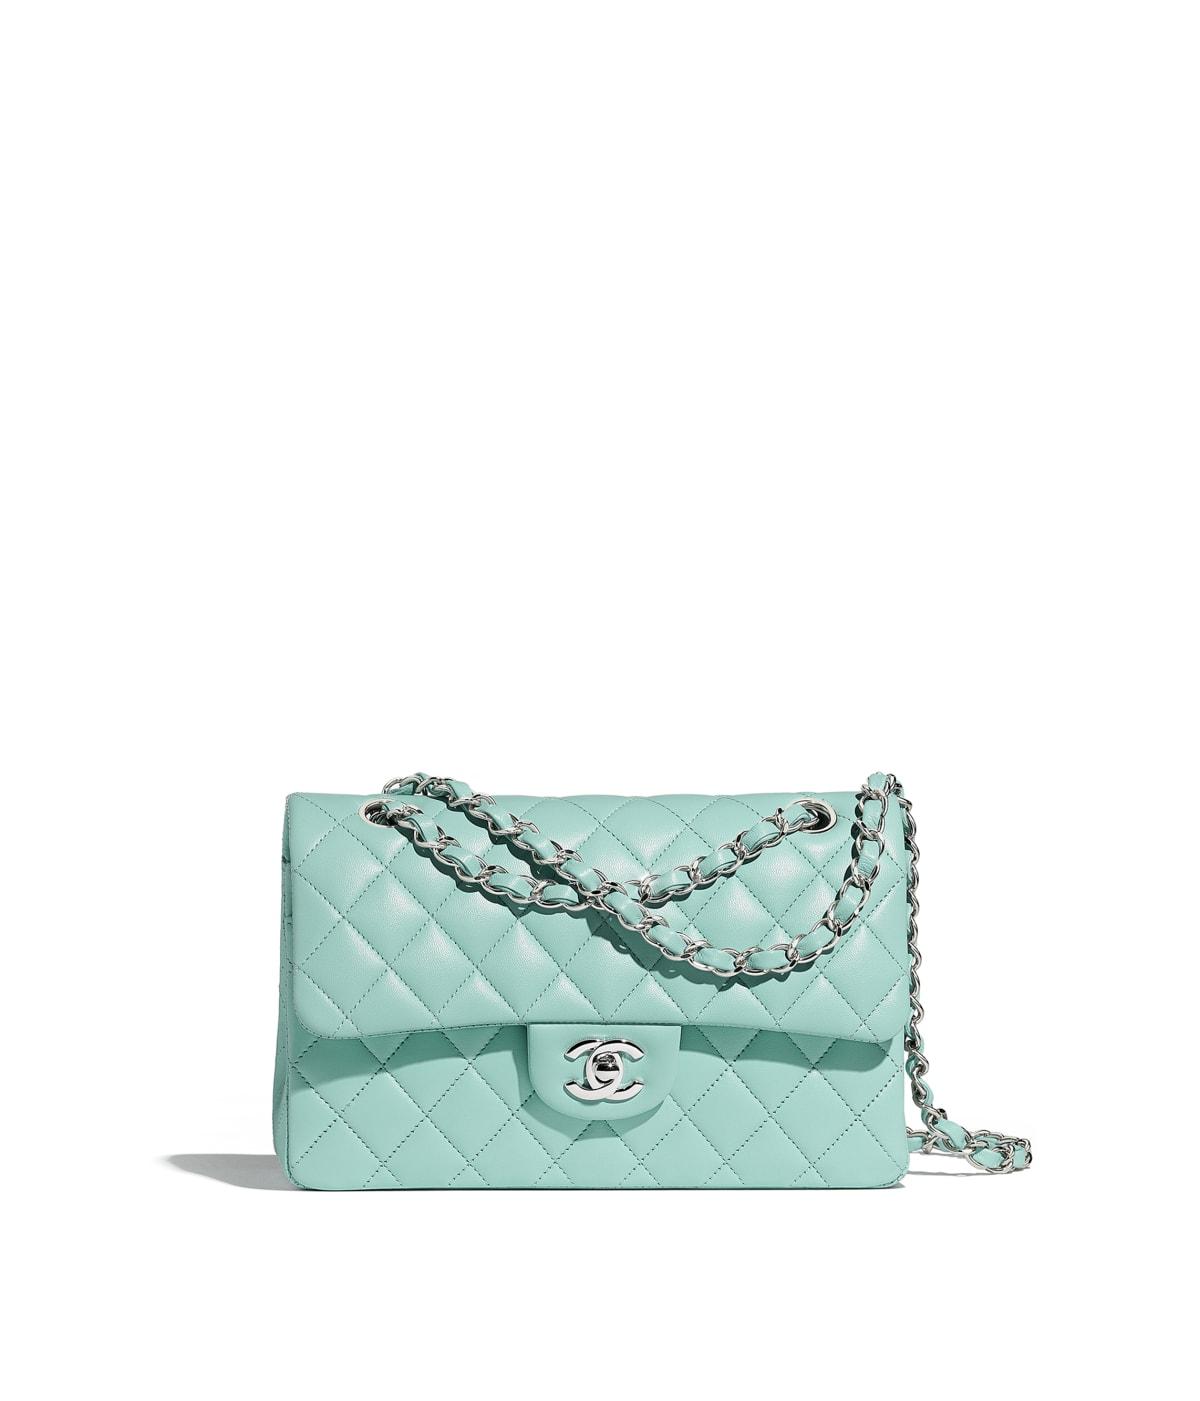 7d847960aacc Small Classic Handbag, lambskin, light blue - CHANEL